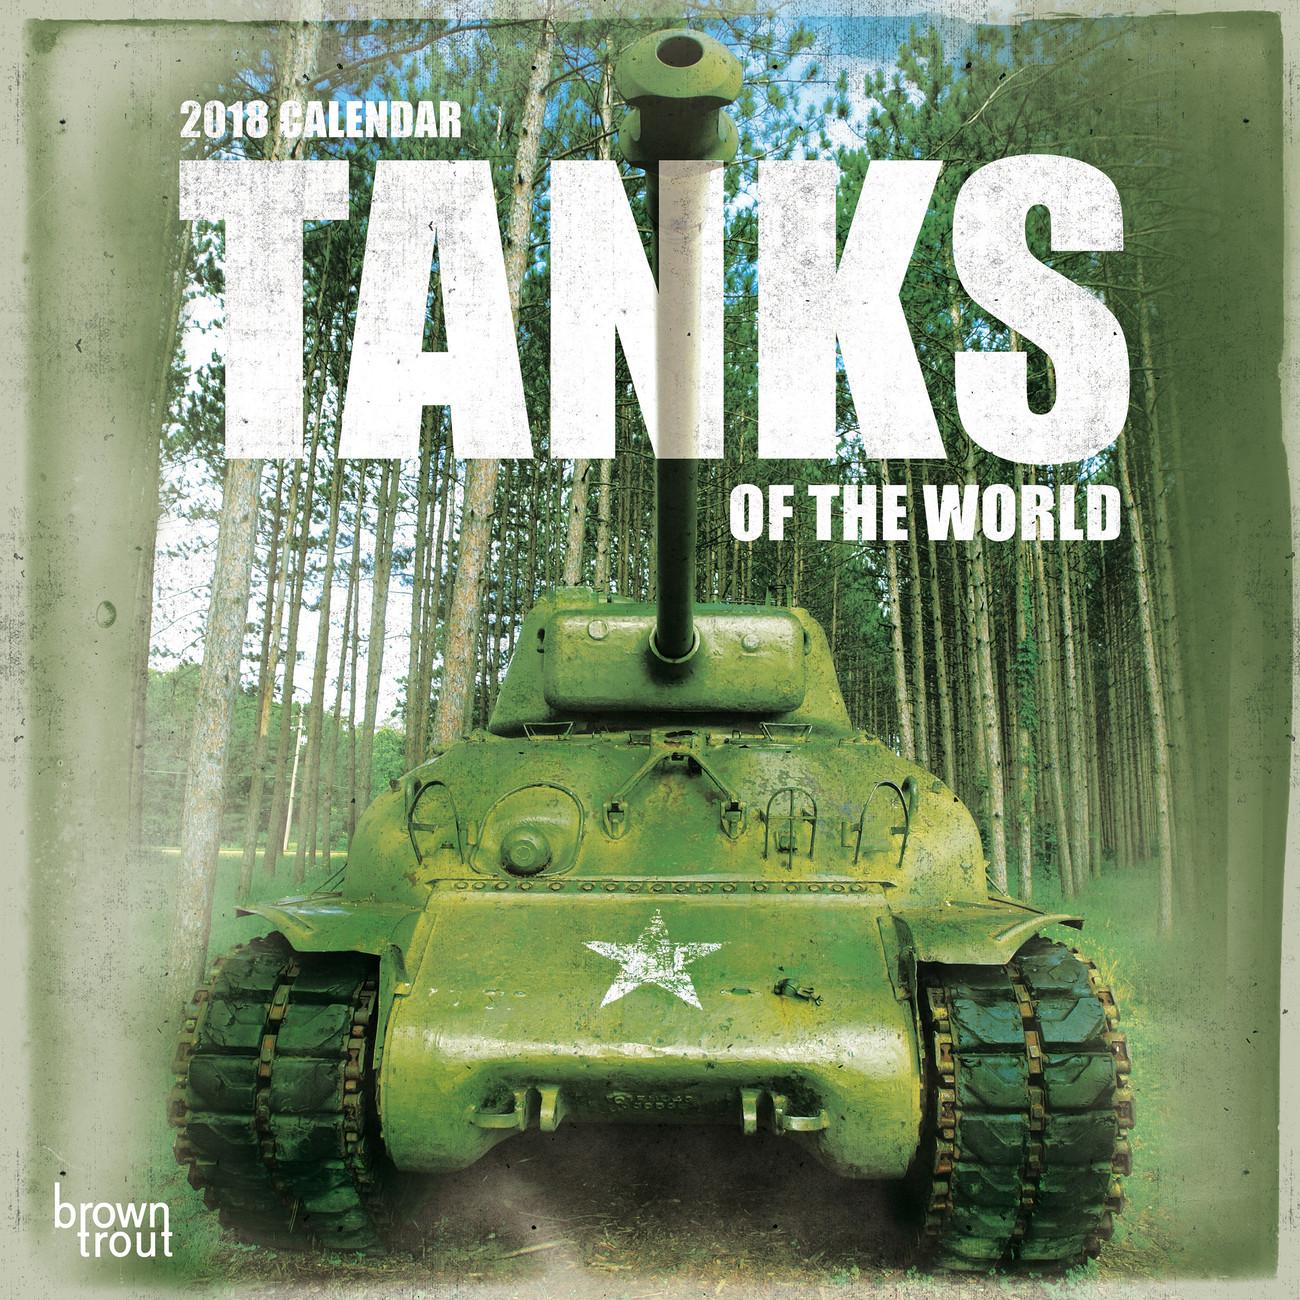 World Of Tanks Advent Calendar 2020.Calendar 2020 Tanks Of The World